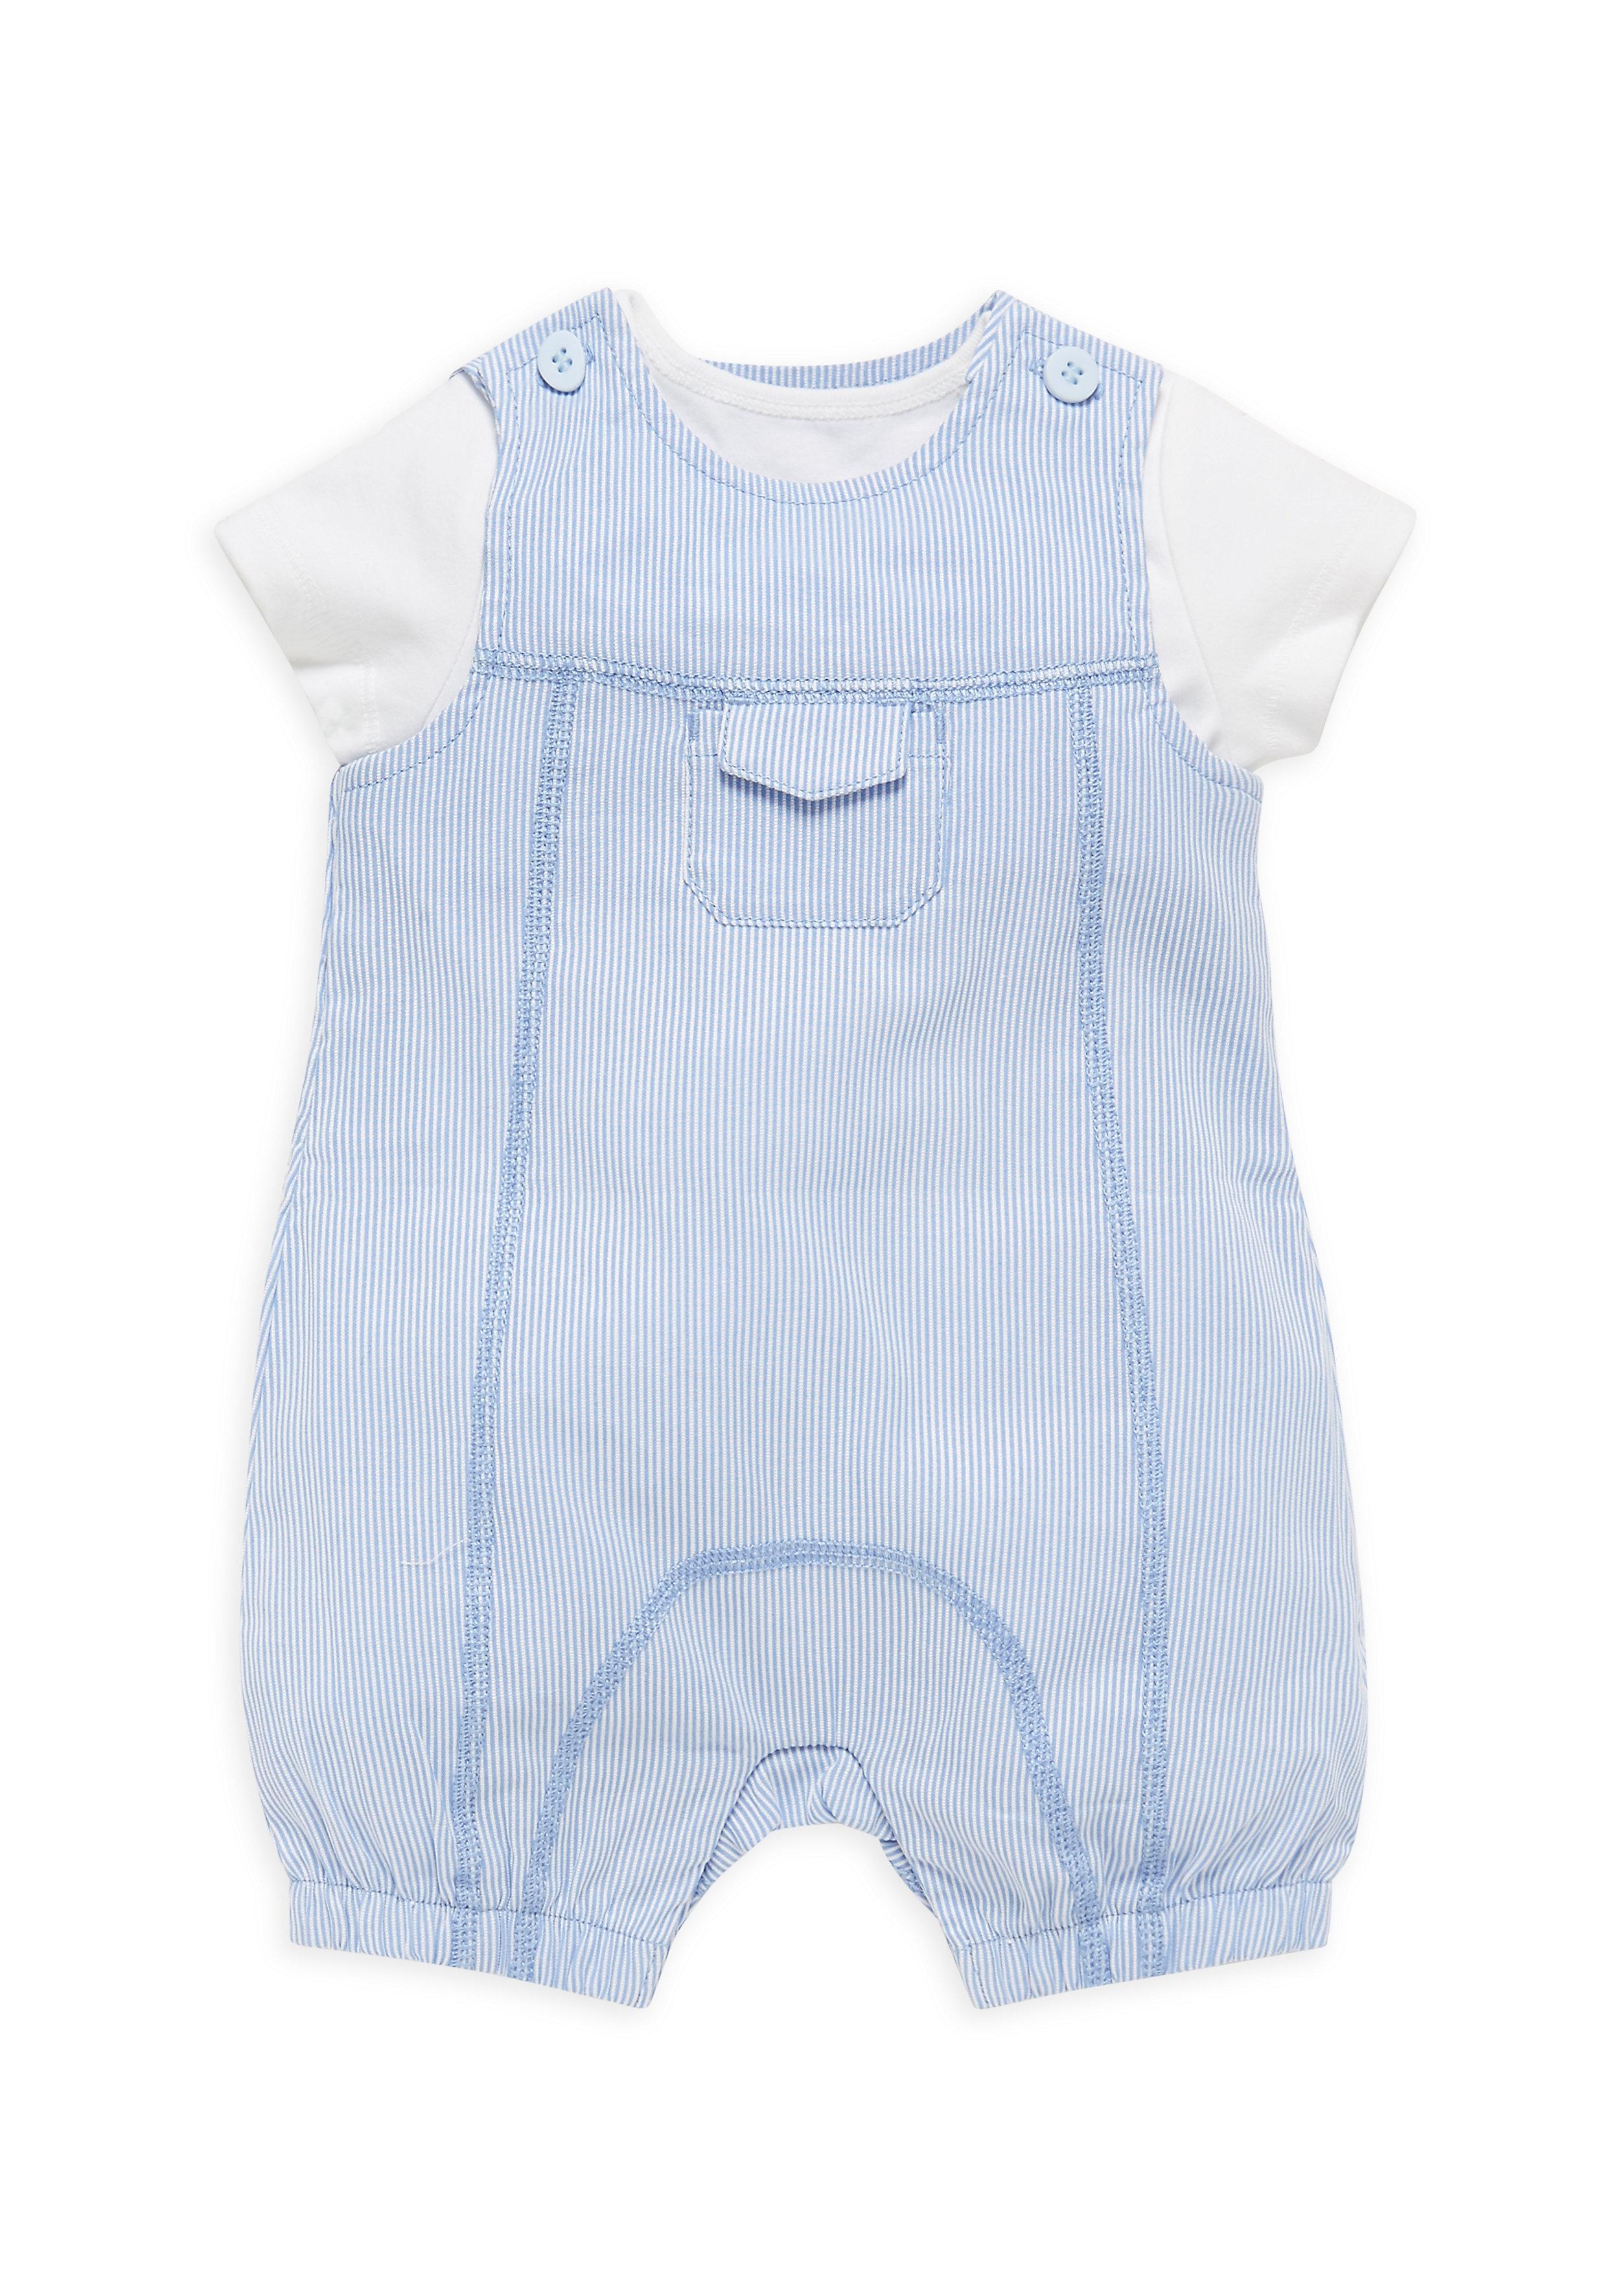 Mothercare | Boys Bibshorts And Bodysuit Set